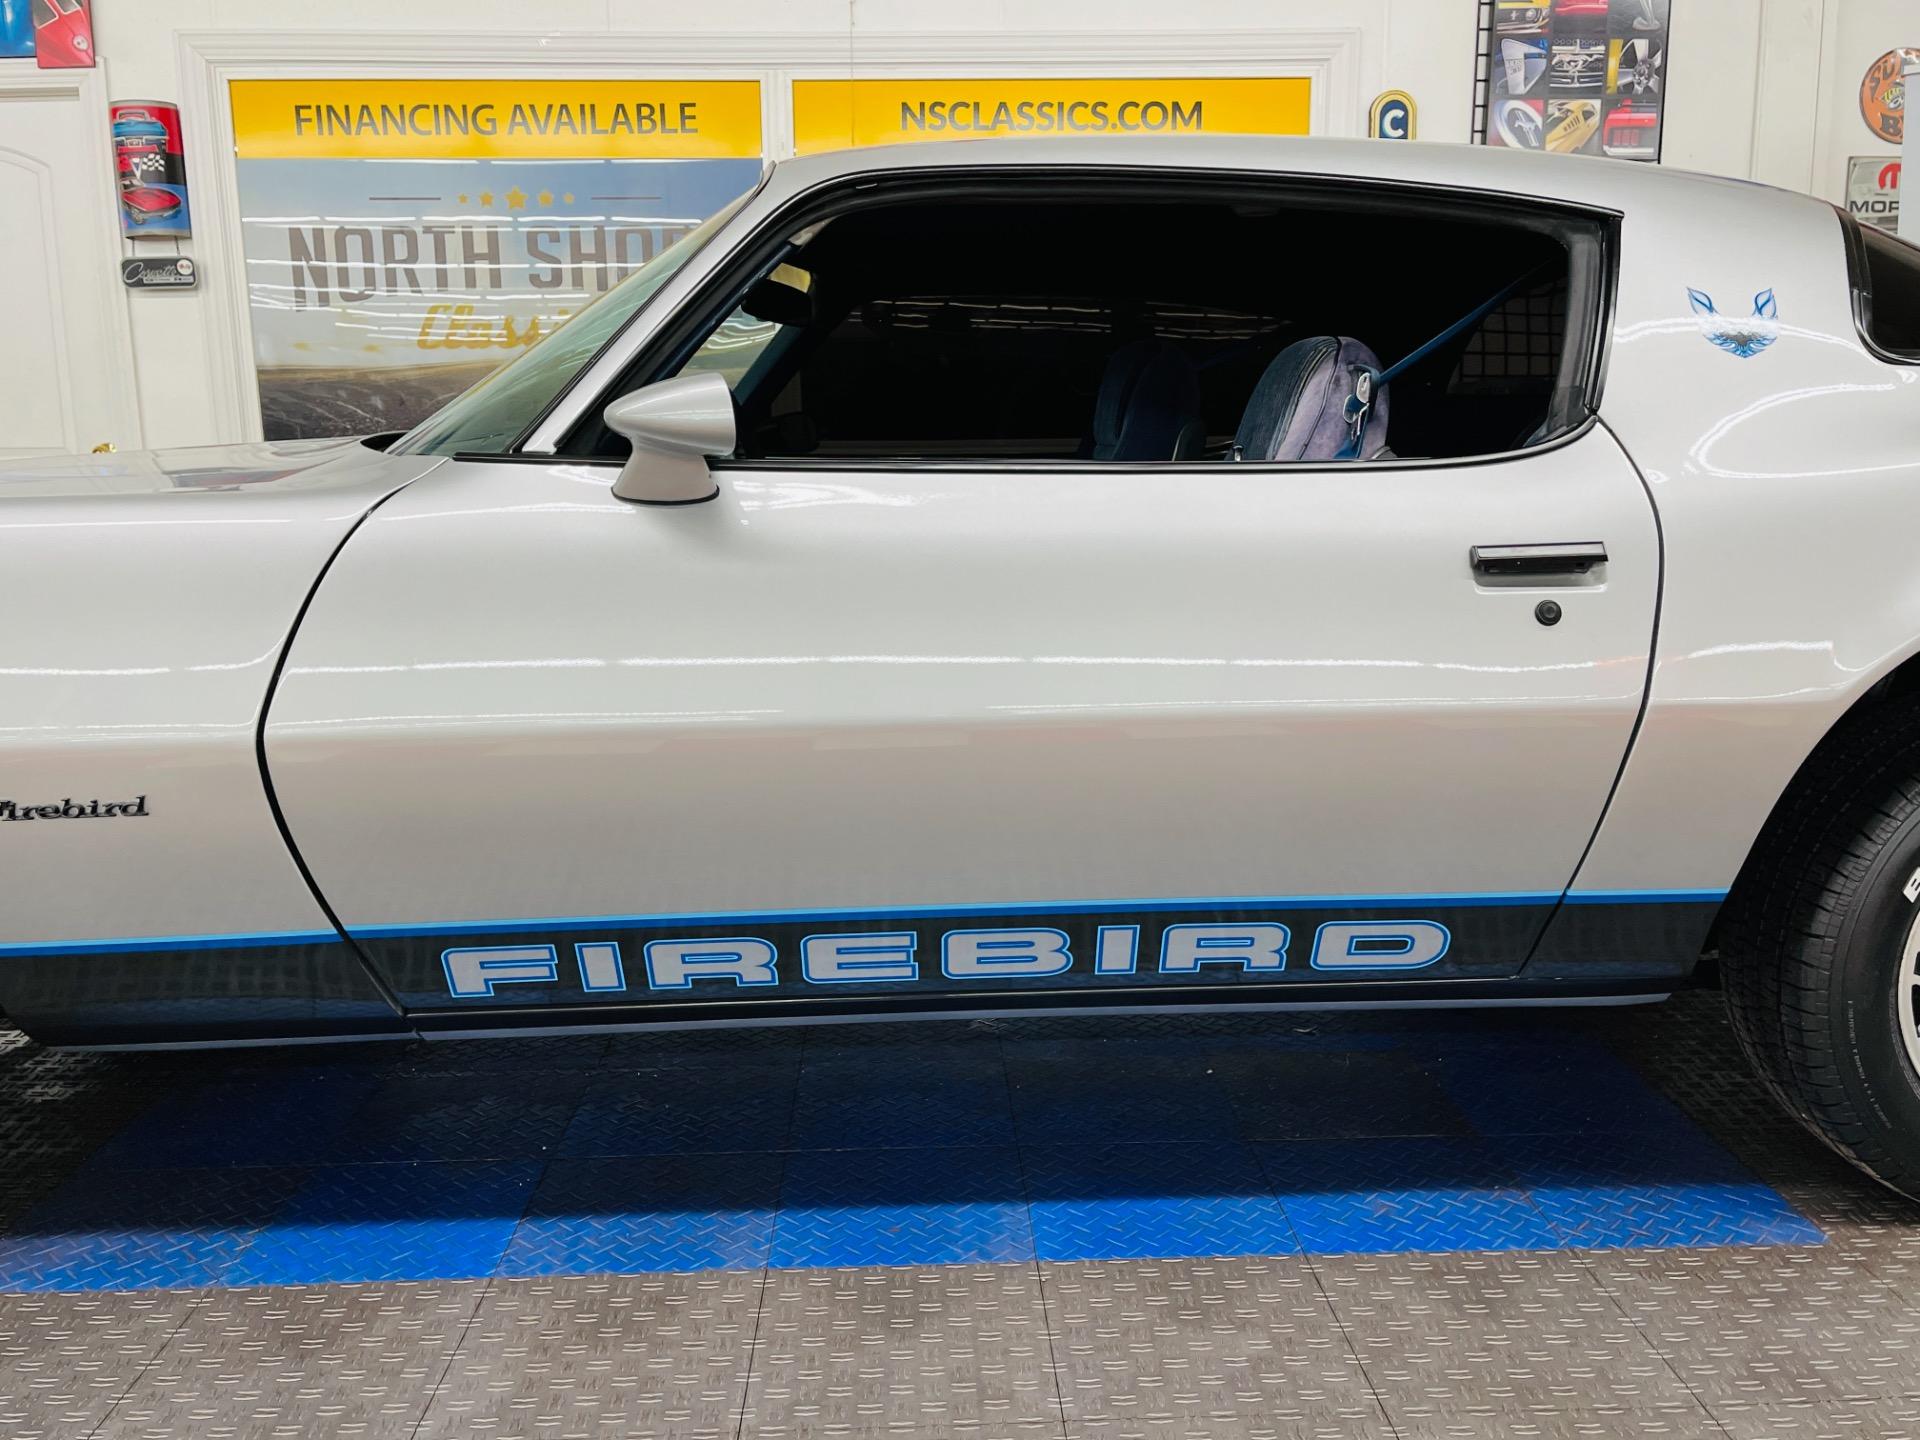 Used 1981 Pontiac Firebird - CLEAN BODY - RECENT PAINT - SEE VIDEO - | Mundelein, IL